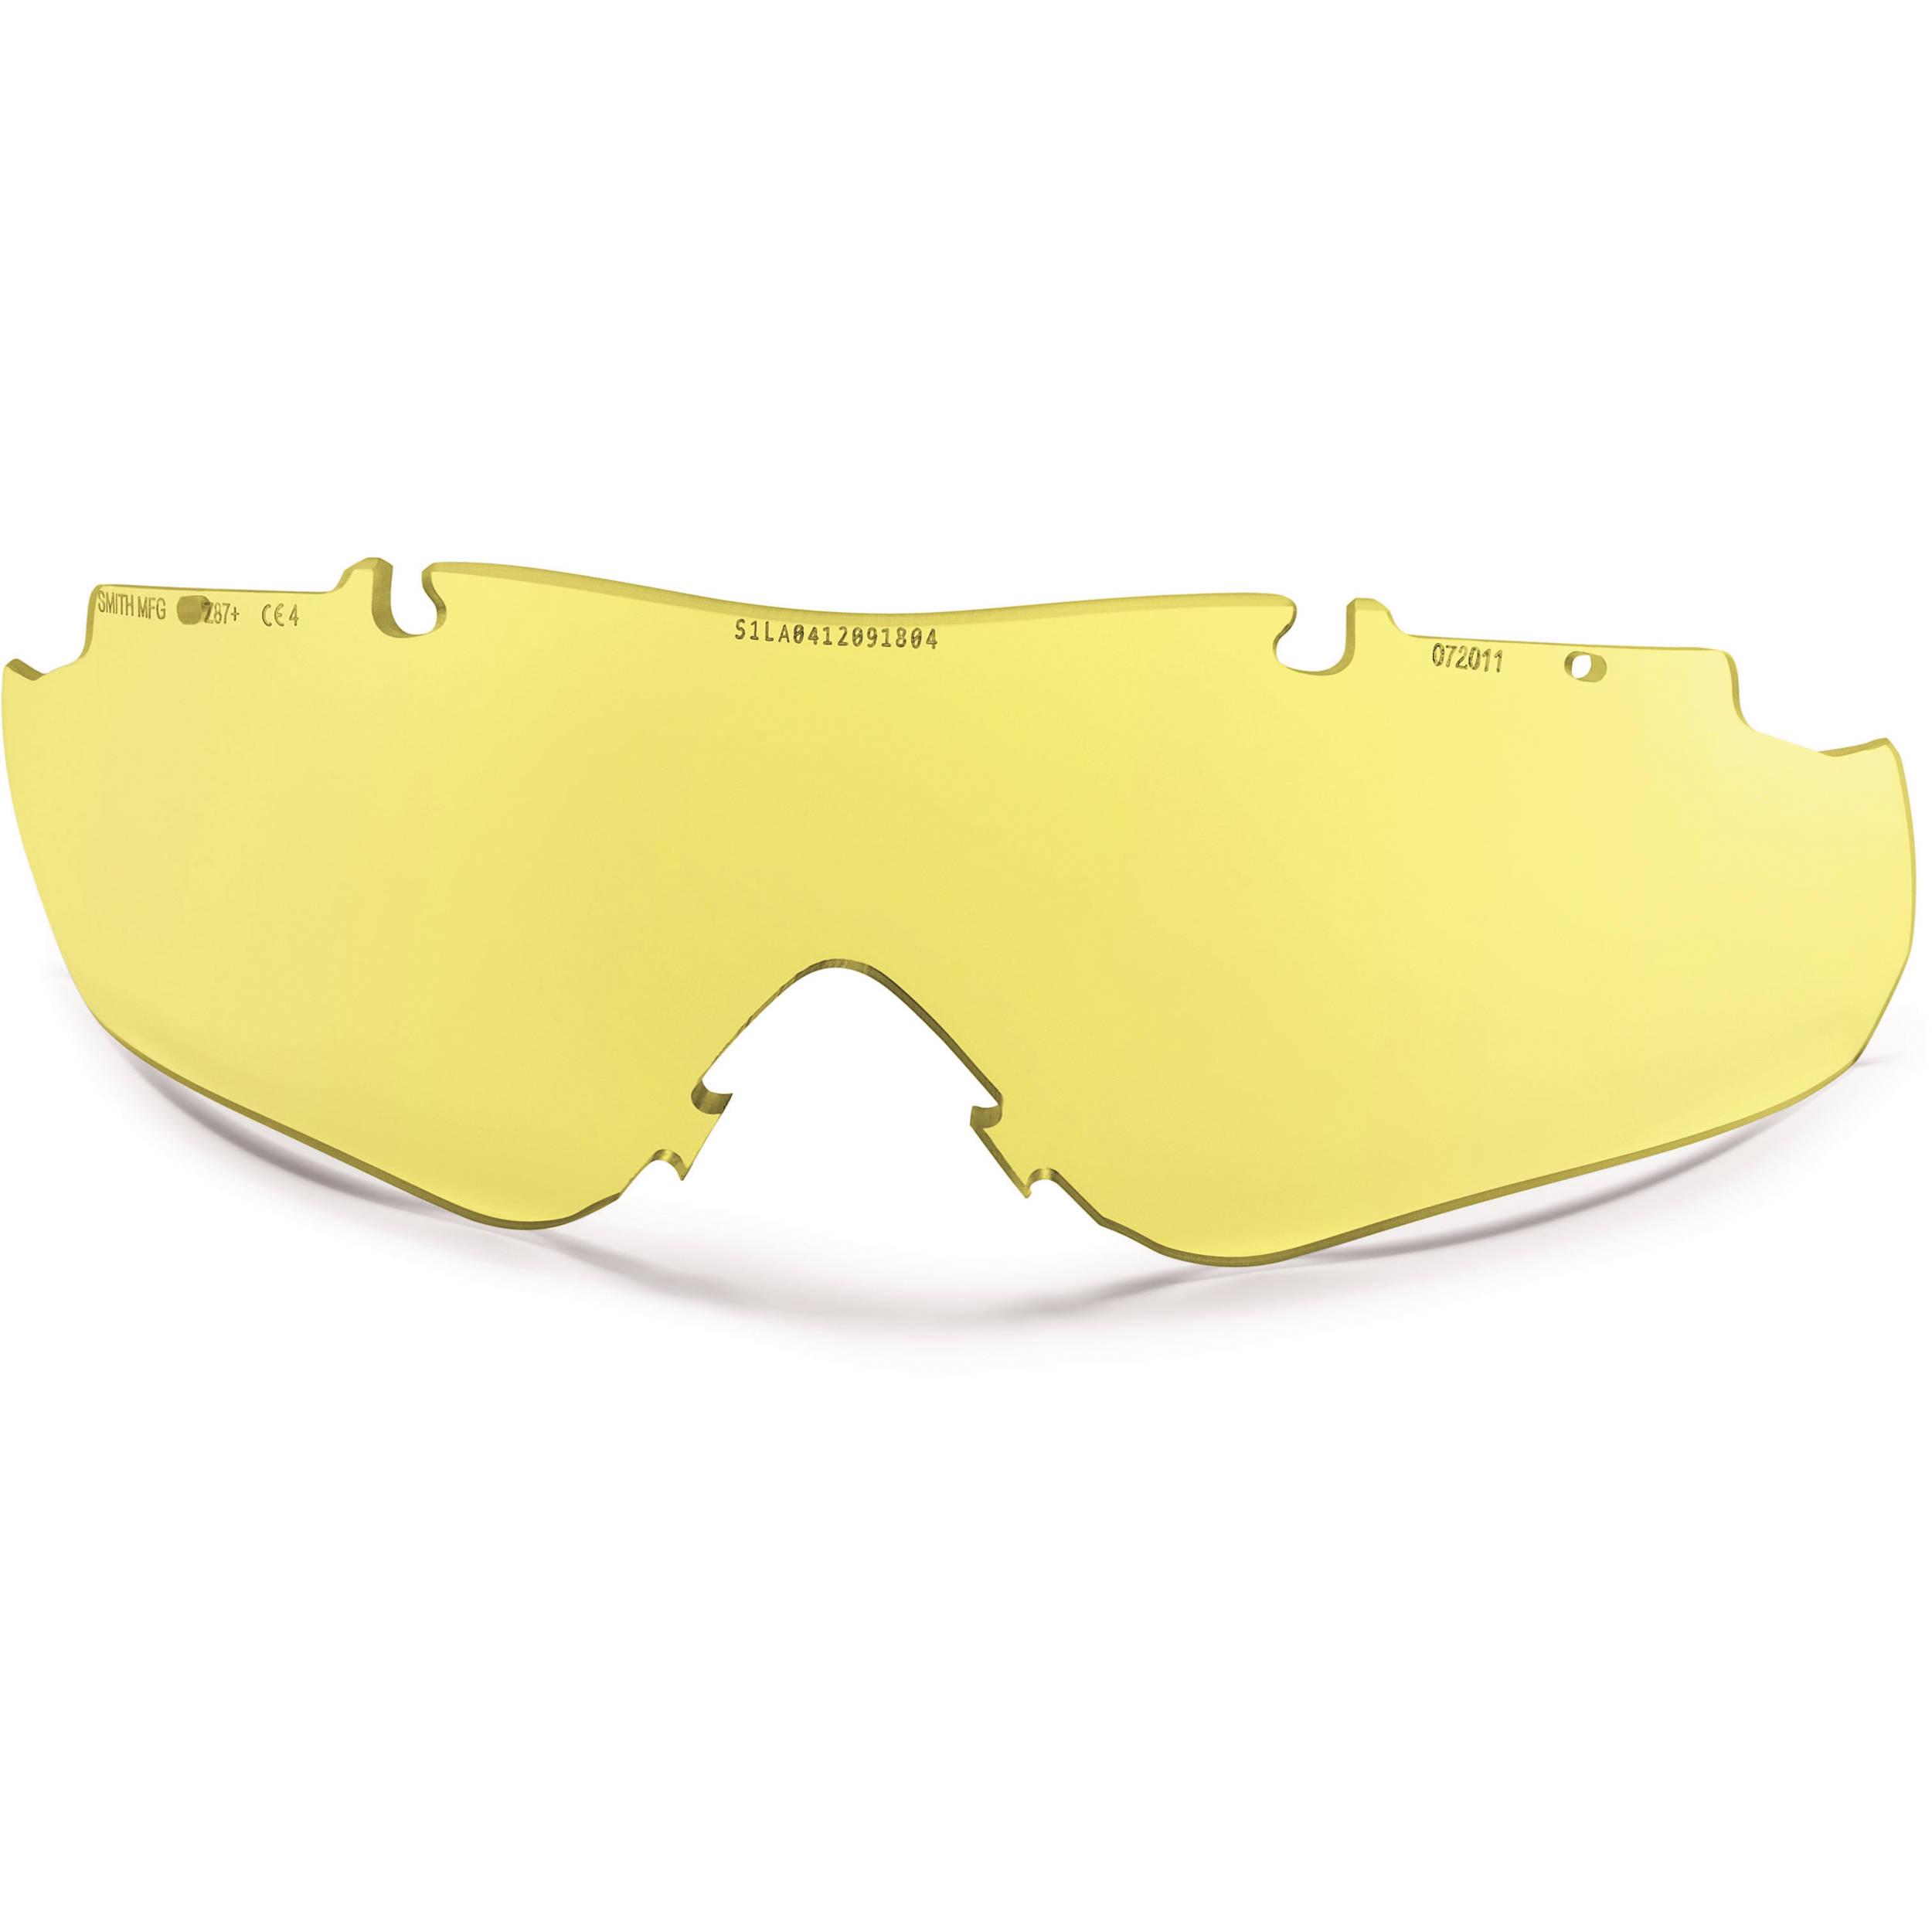 1f84d0e67b6 Smith Trace Sunglasses Replacement Lenses